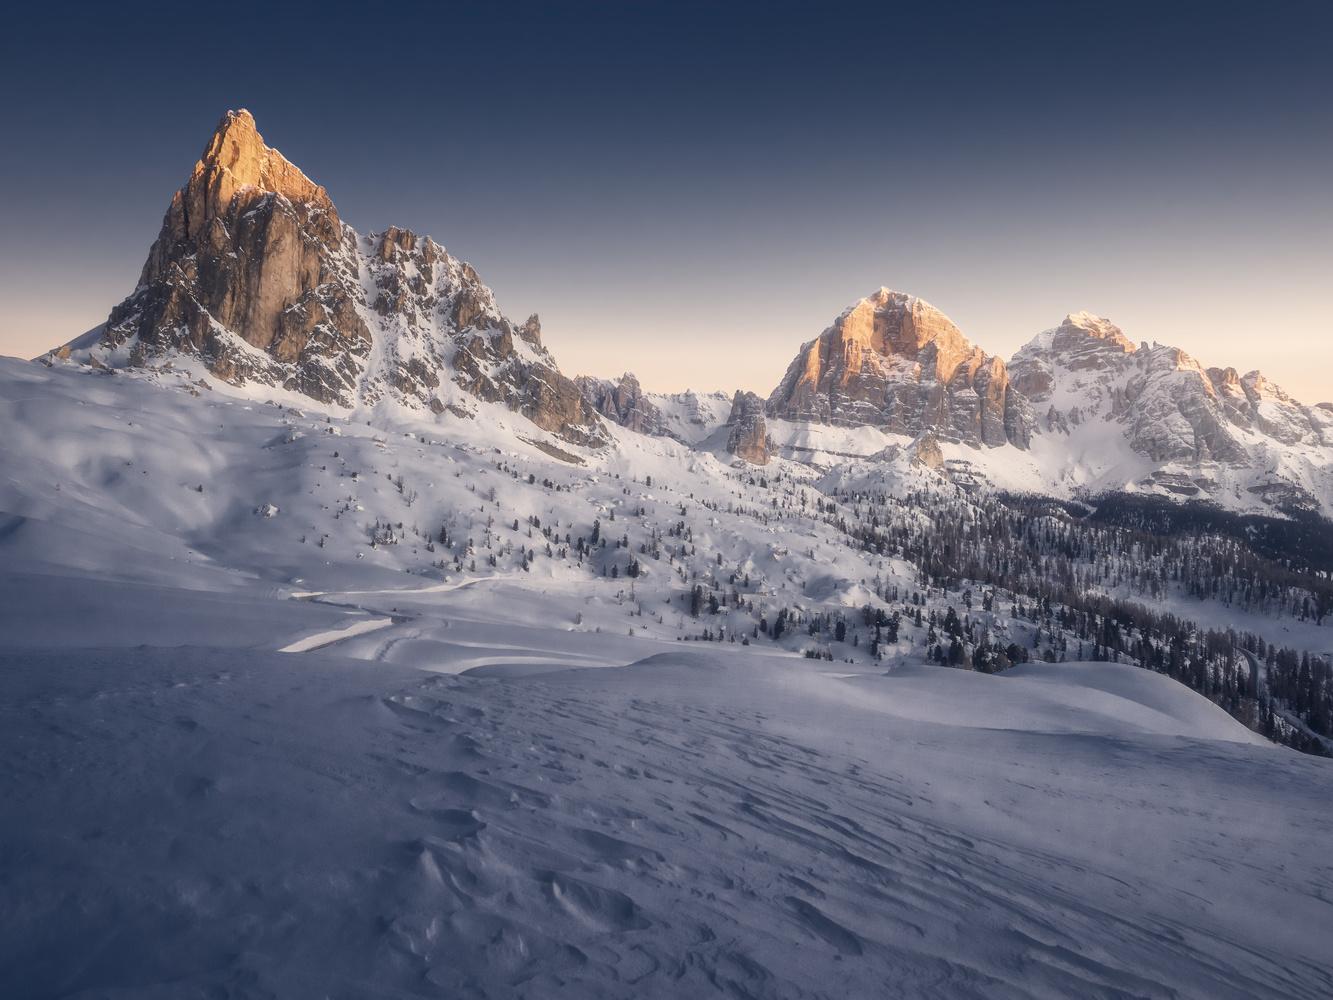 Cold sunrise by Michele Buttazzoni